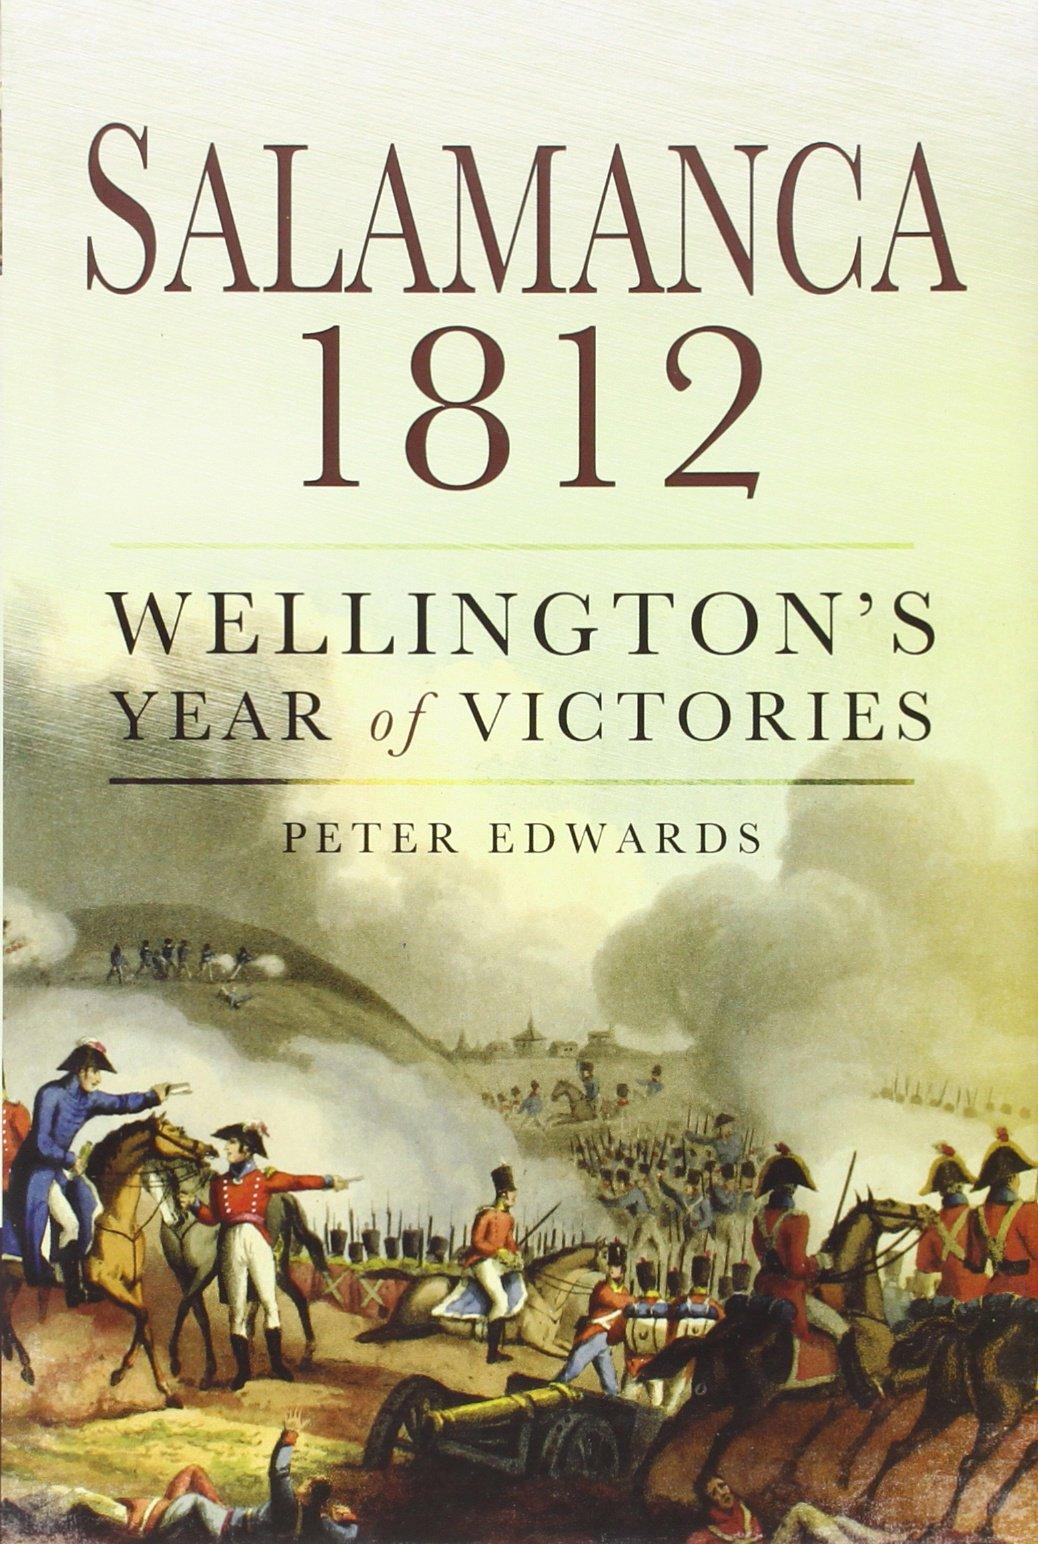 Salamanca 1812: Wellington's Year of Victories: Peter J. Edwards:  9781781590799: Amazon.com: Books